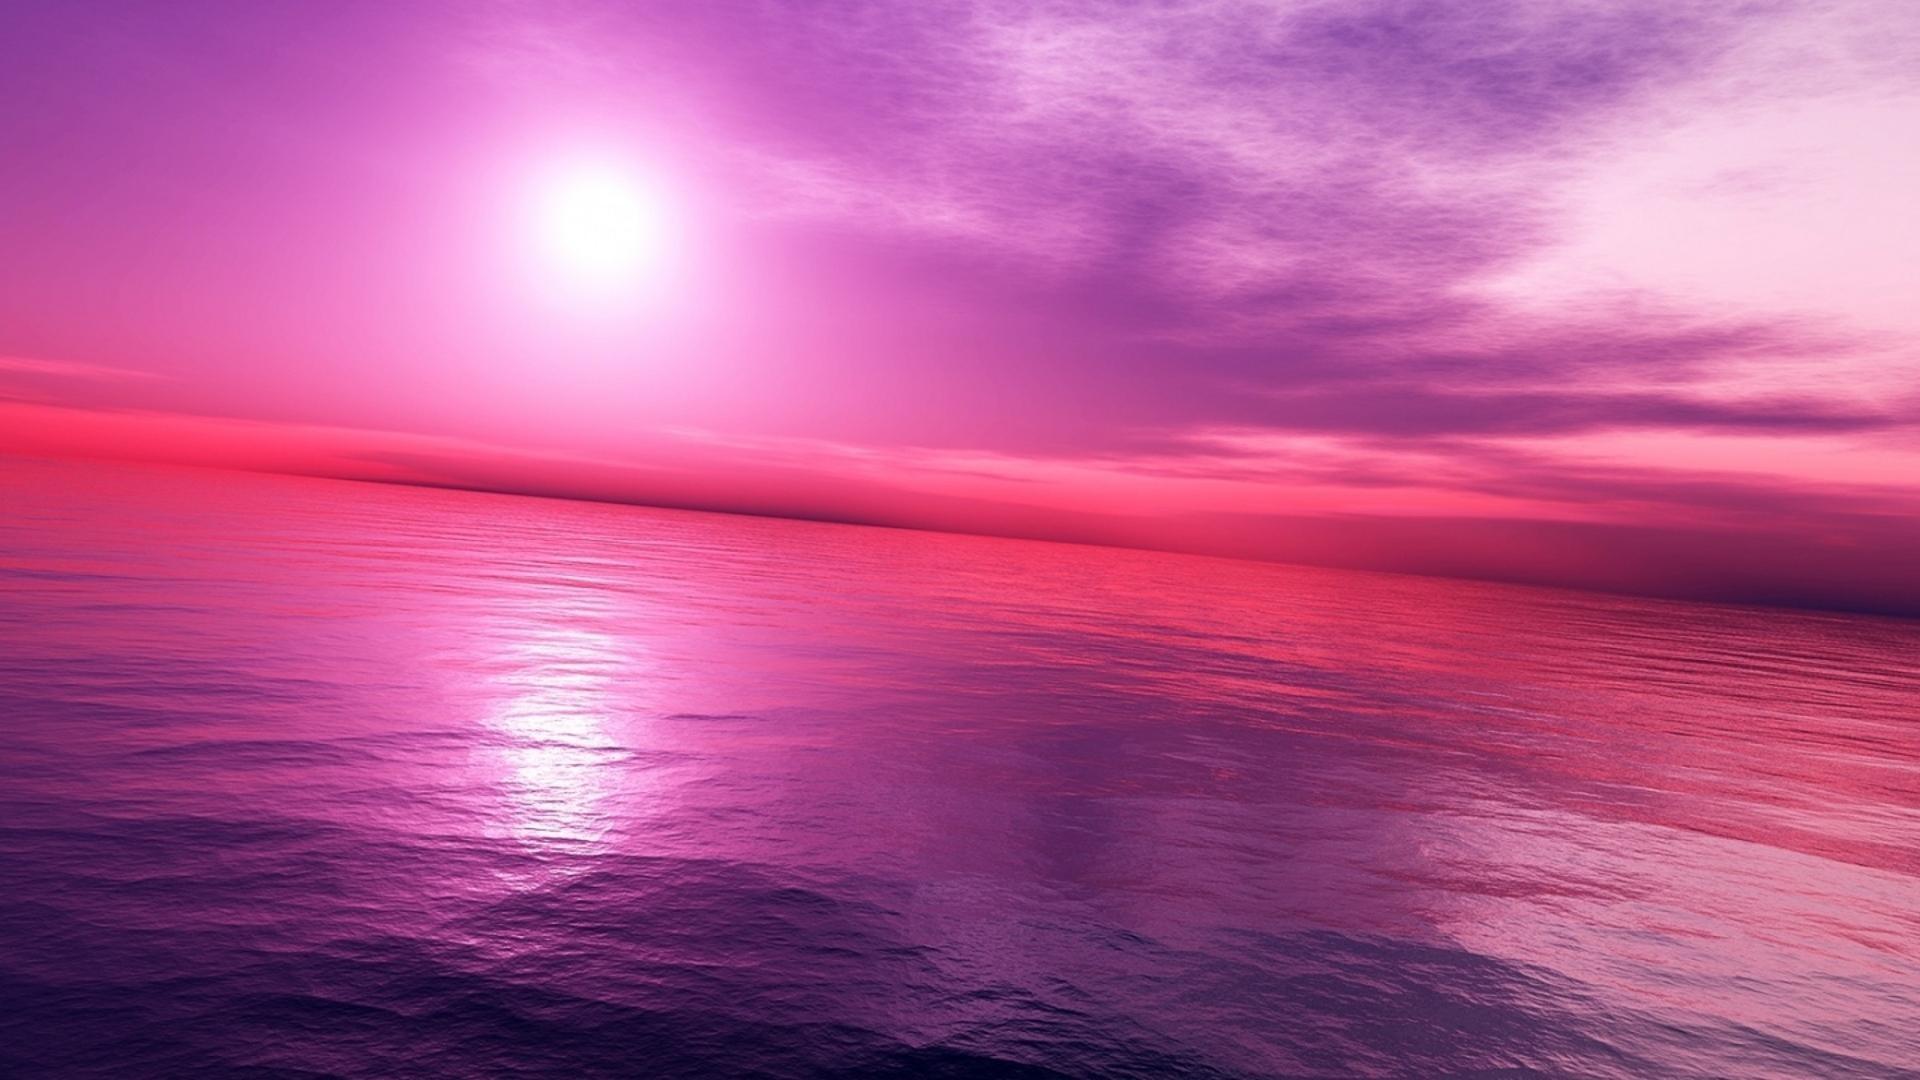 Purple Sunset hd wallpaper download